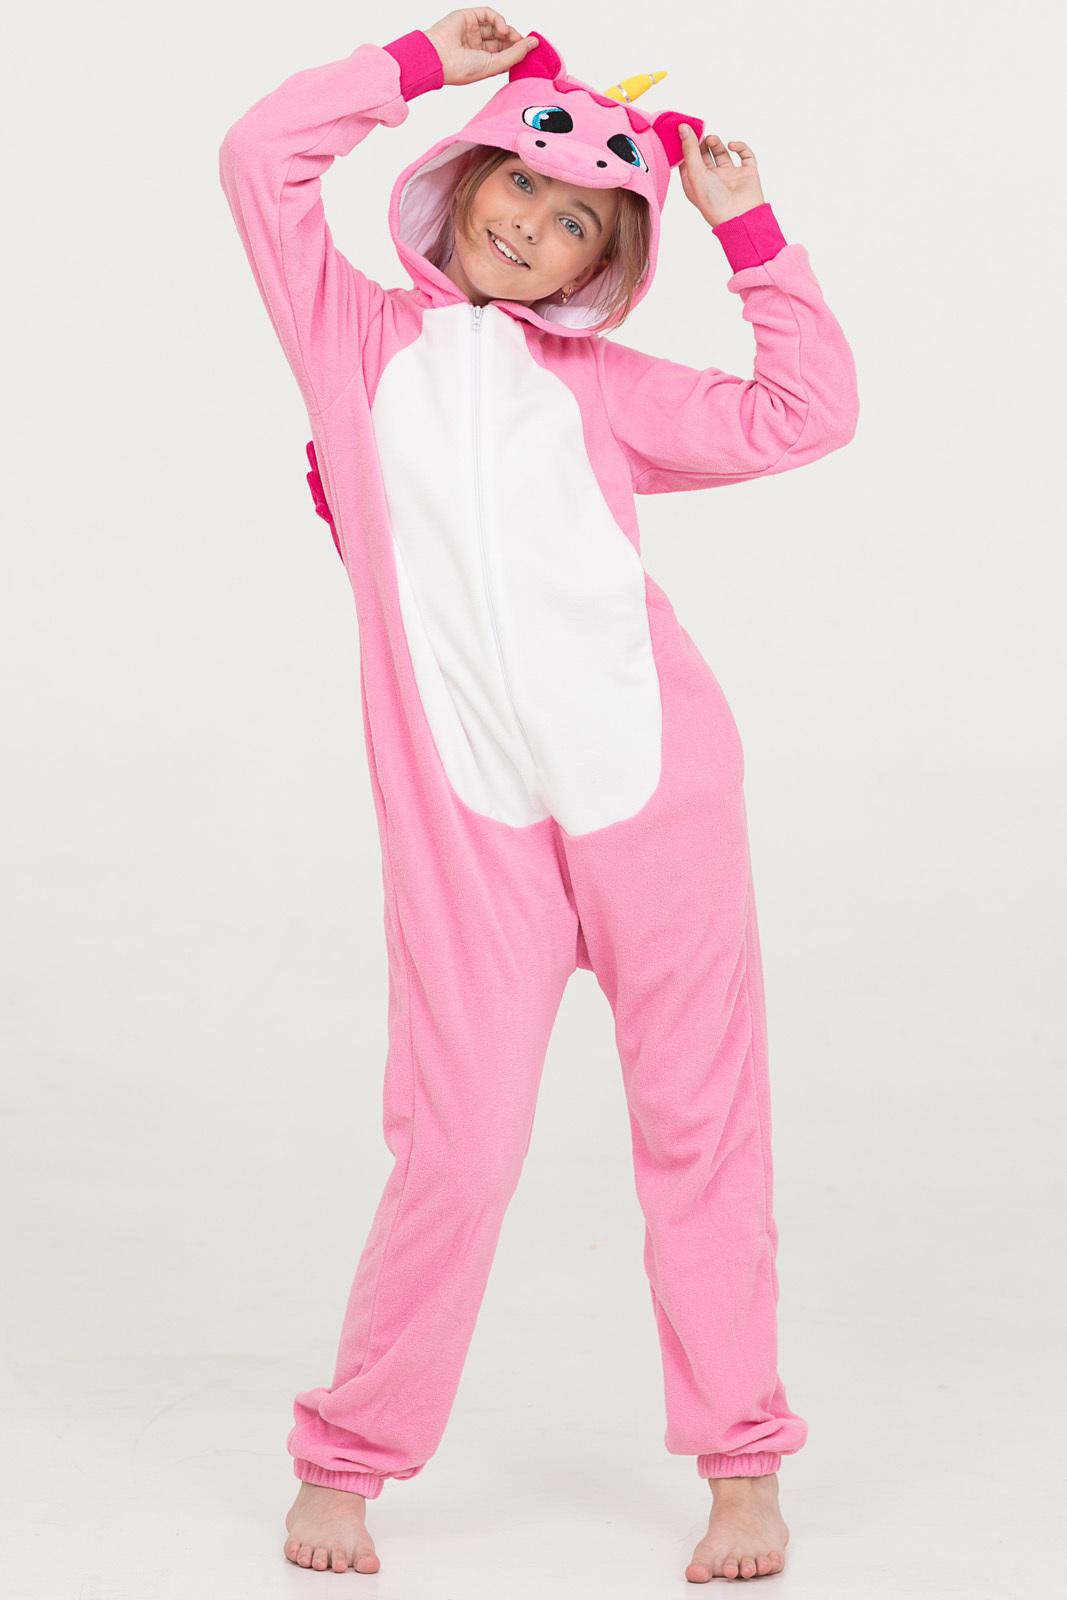 aeaf002f2381 Детская пижама-кигуруми